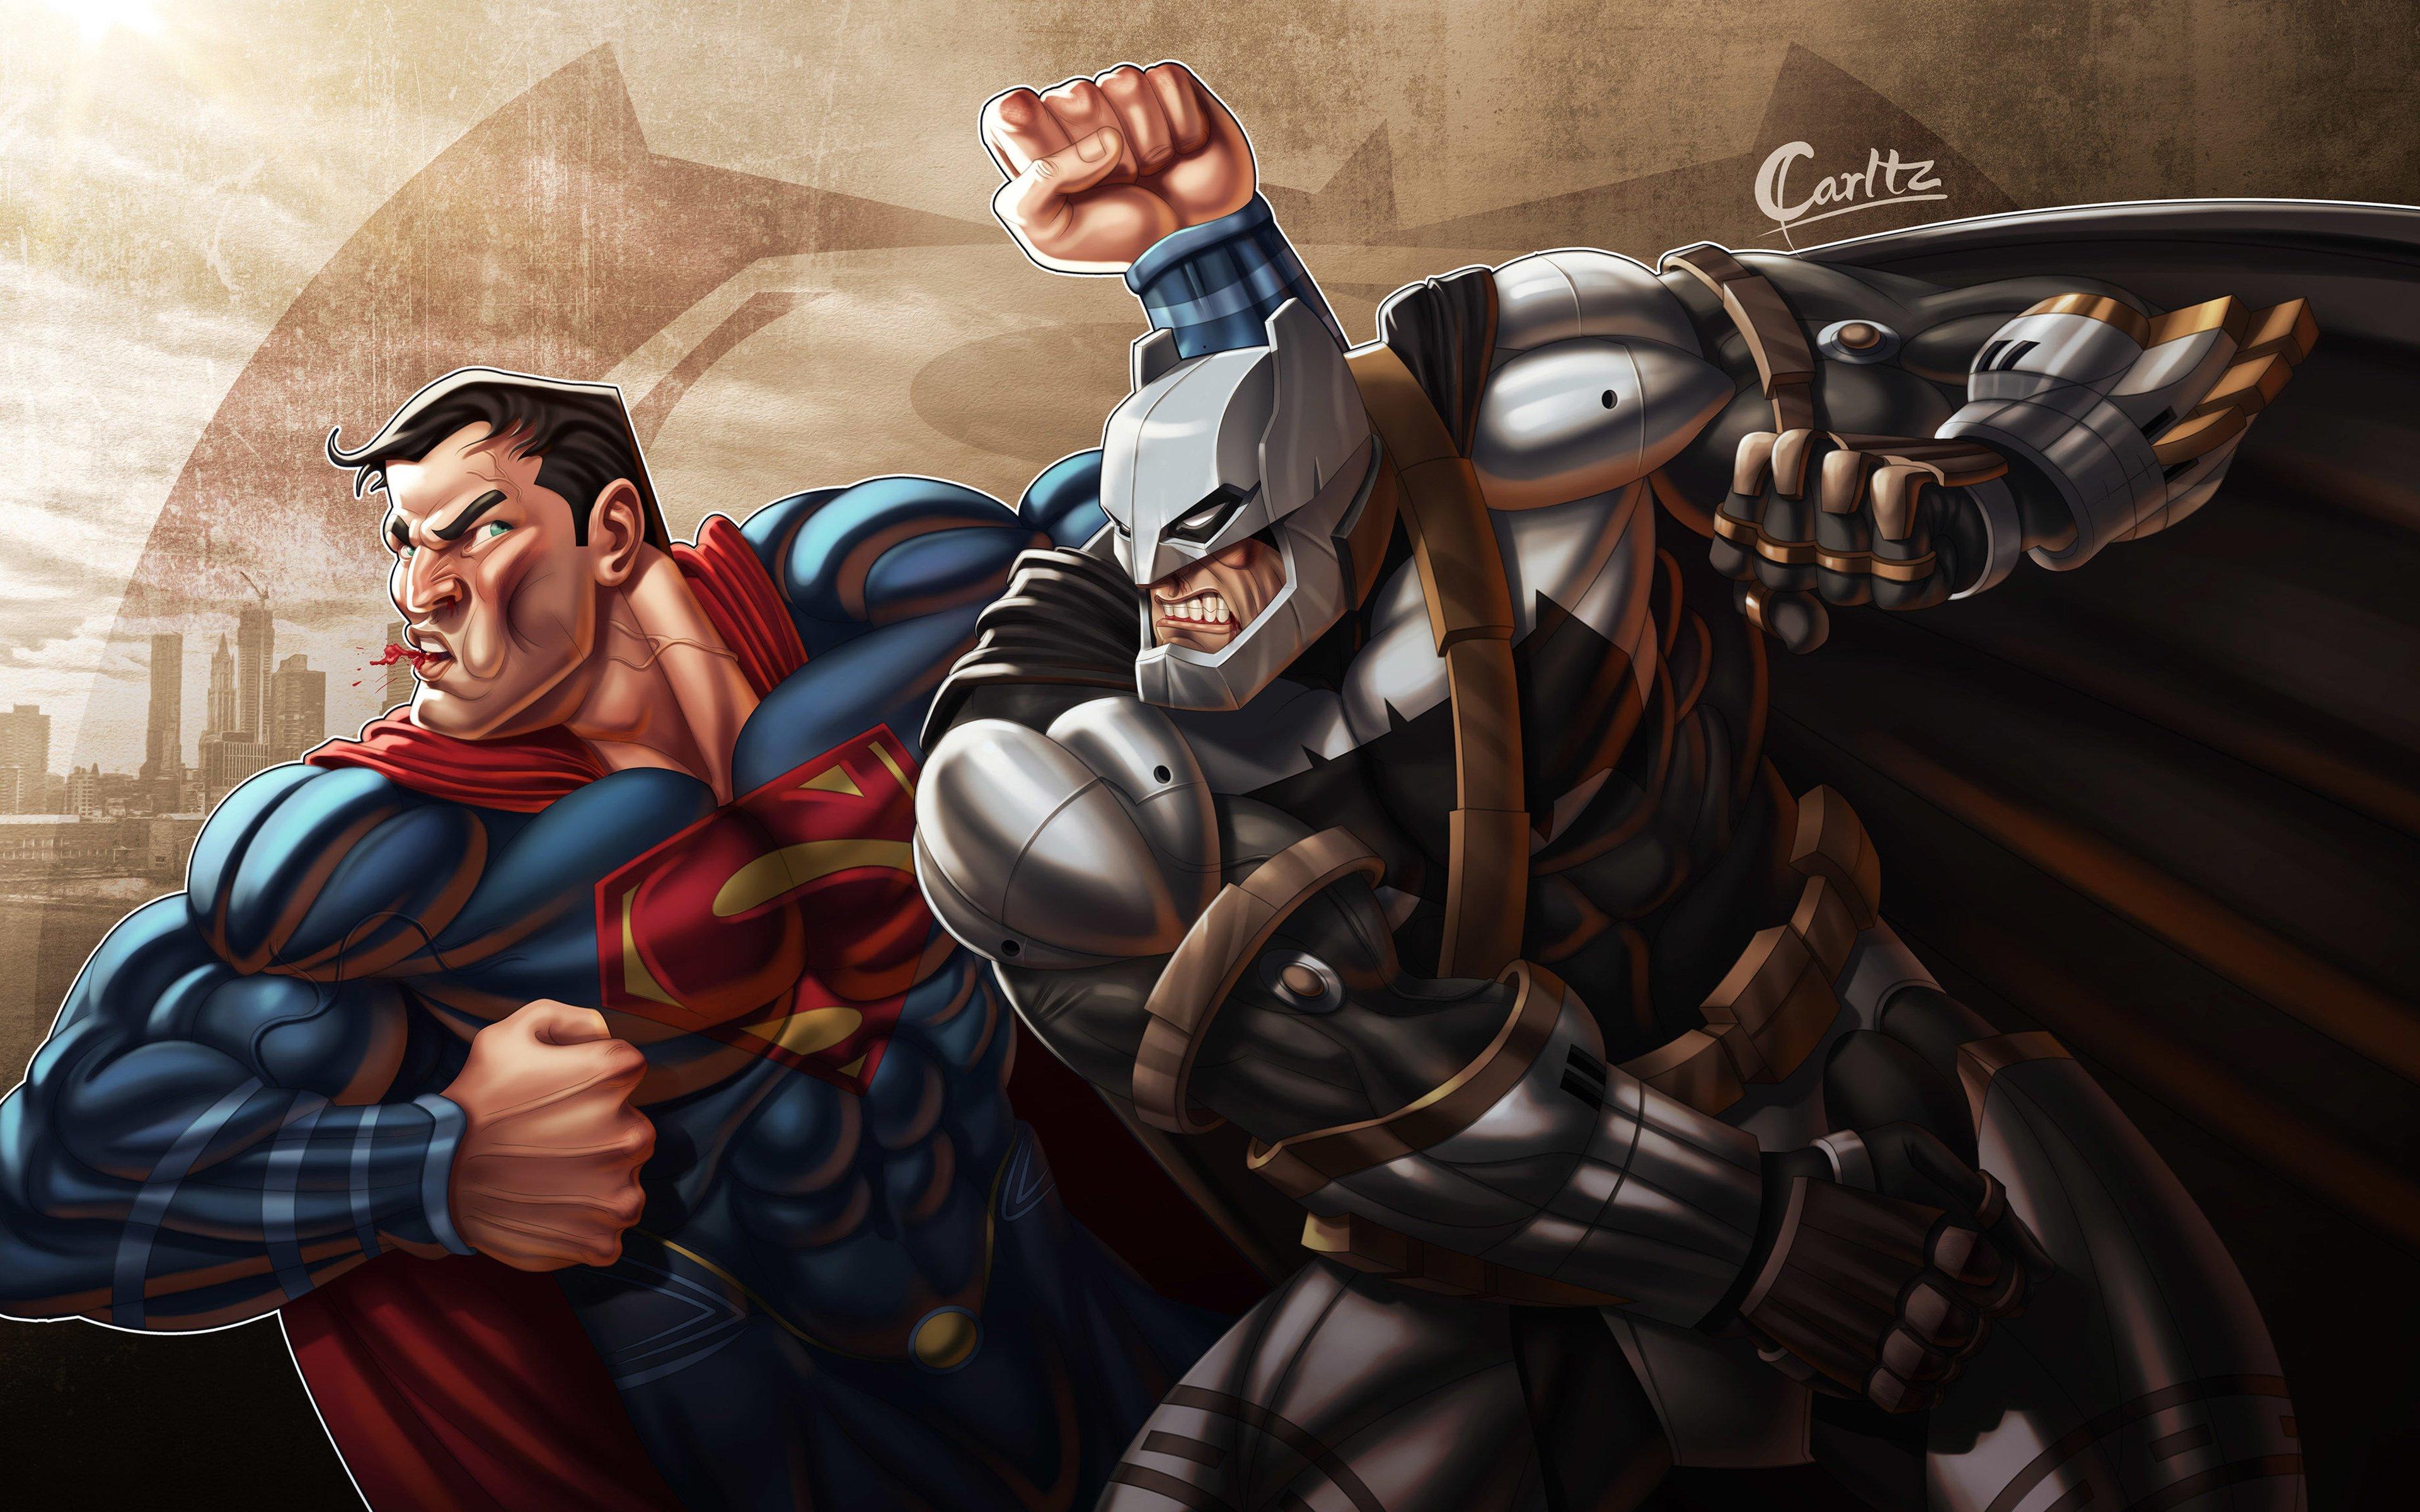 Fondos de pantalla Batman derrotando a Superman